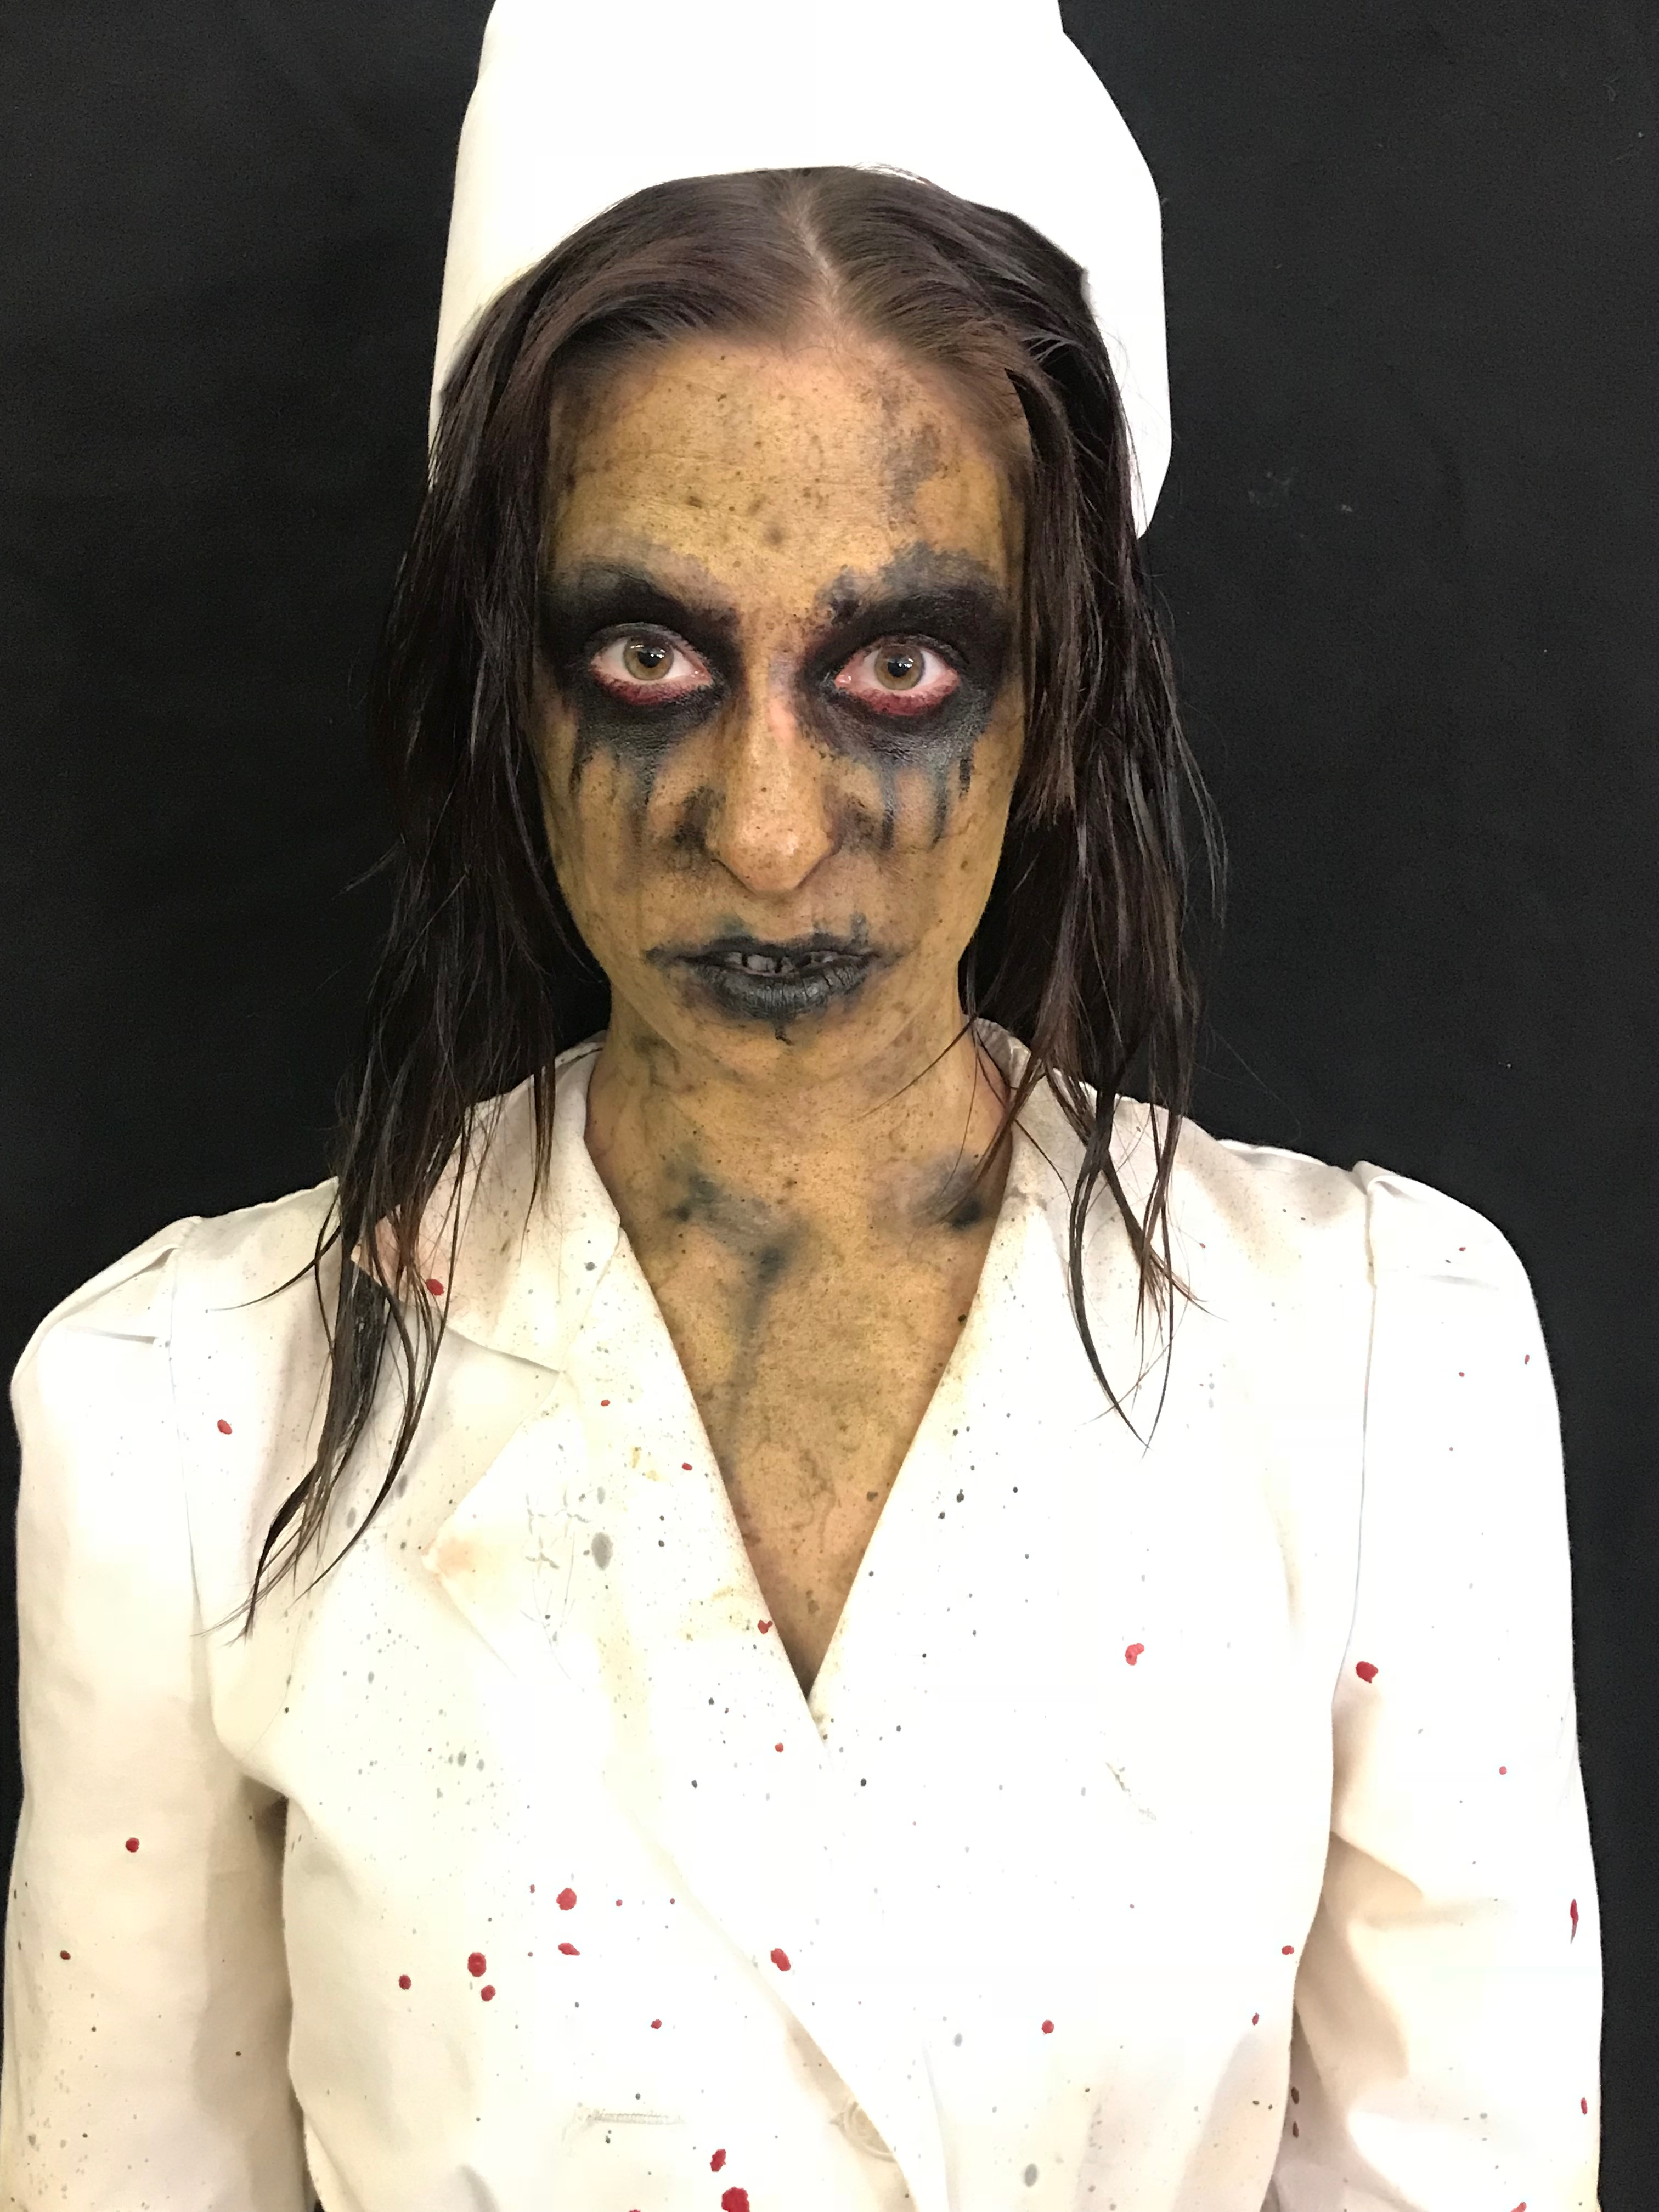 American Horror Story Nurse Makeup